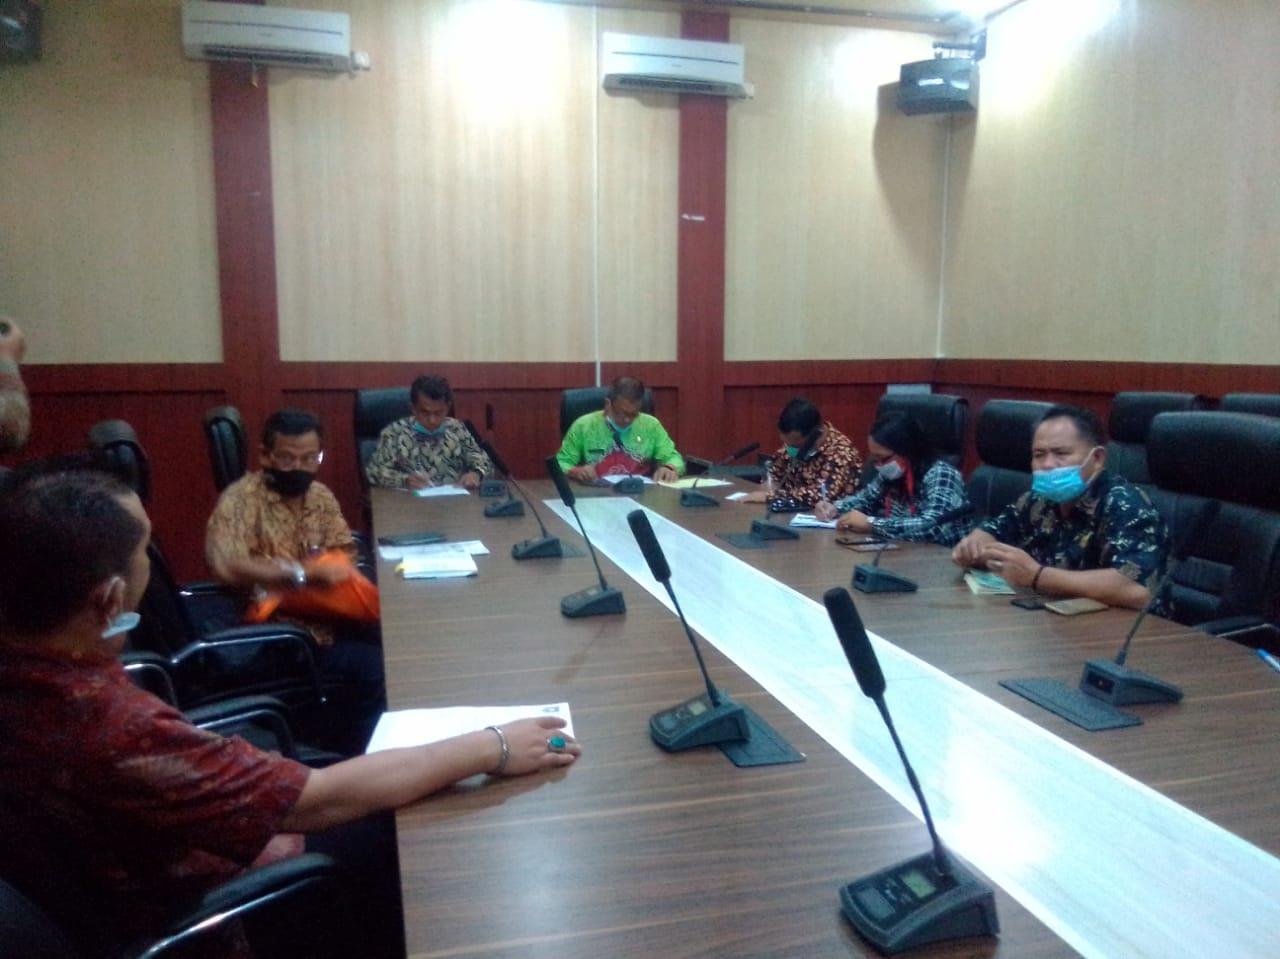 Wakil Rakyat Belitung Sampaikan Aspirasi Pembangunan Dermaga Pulau Seliuk